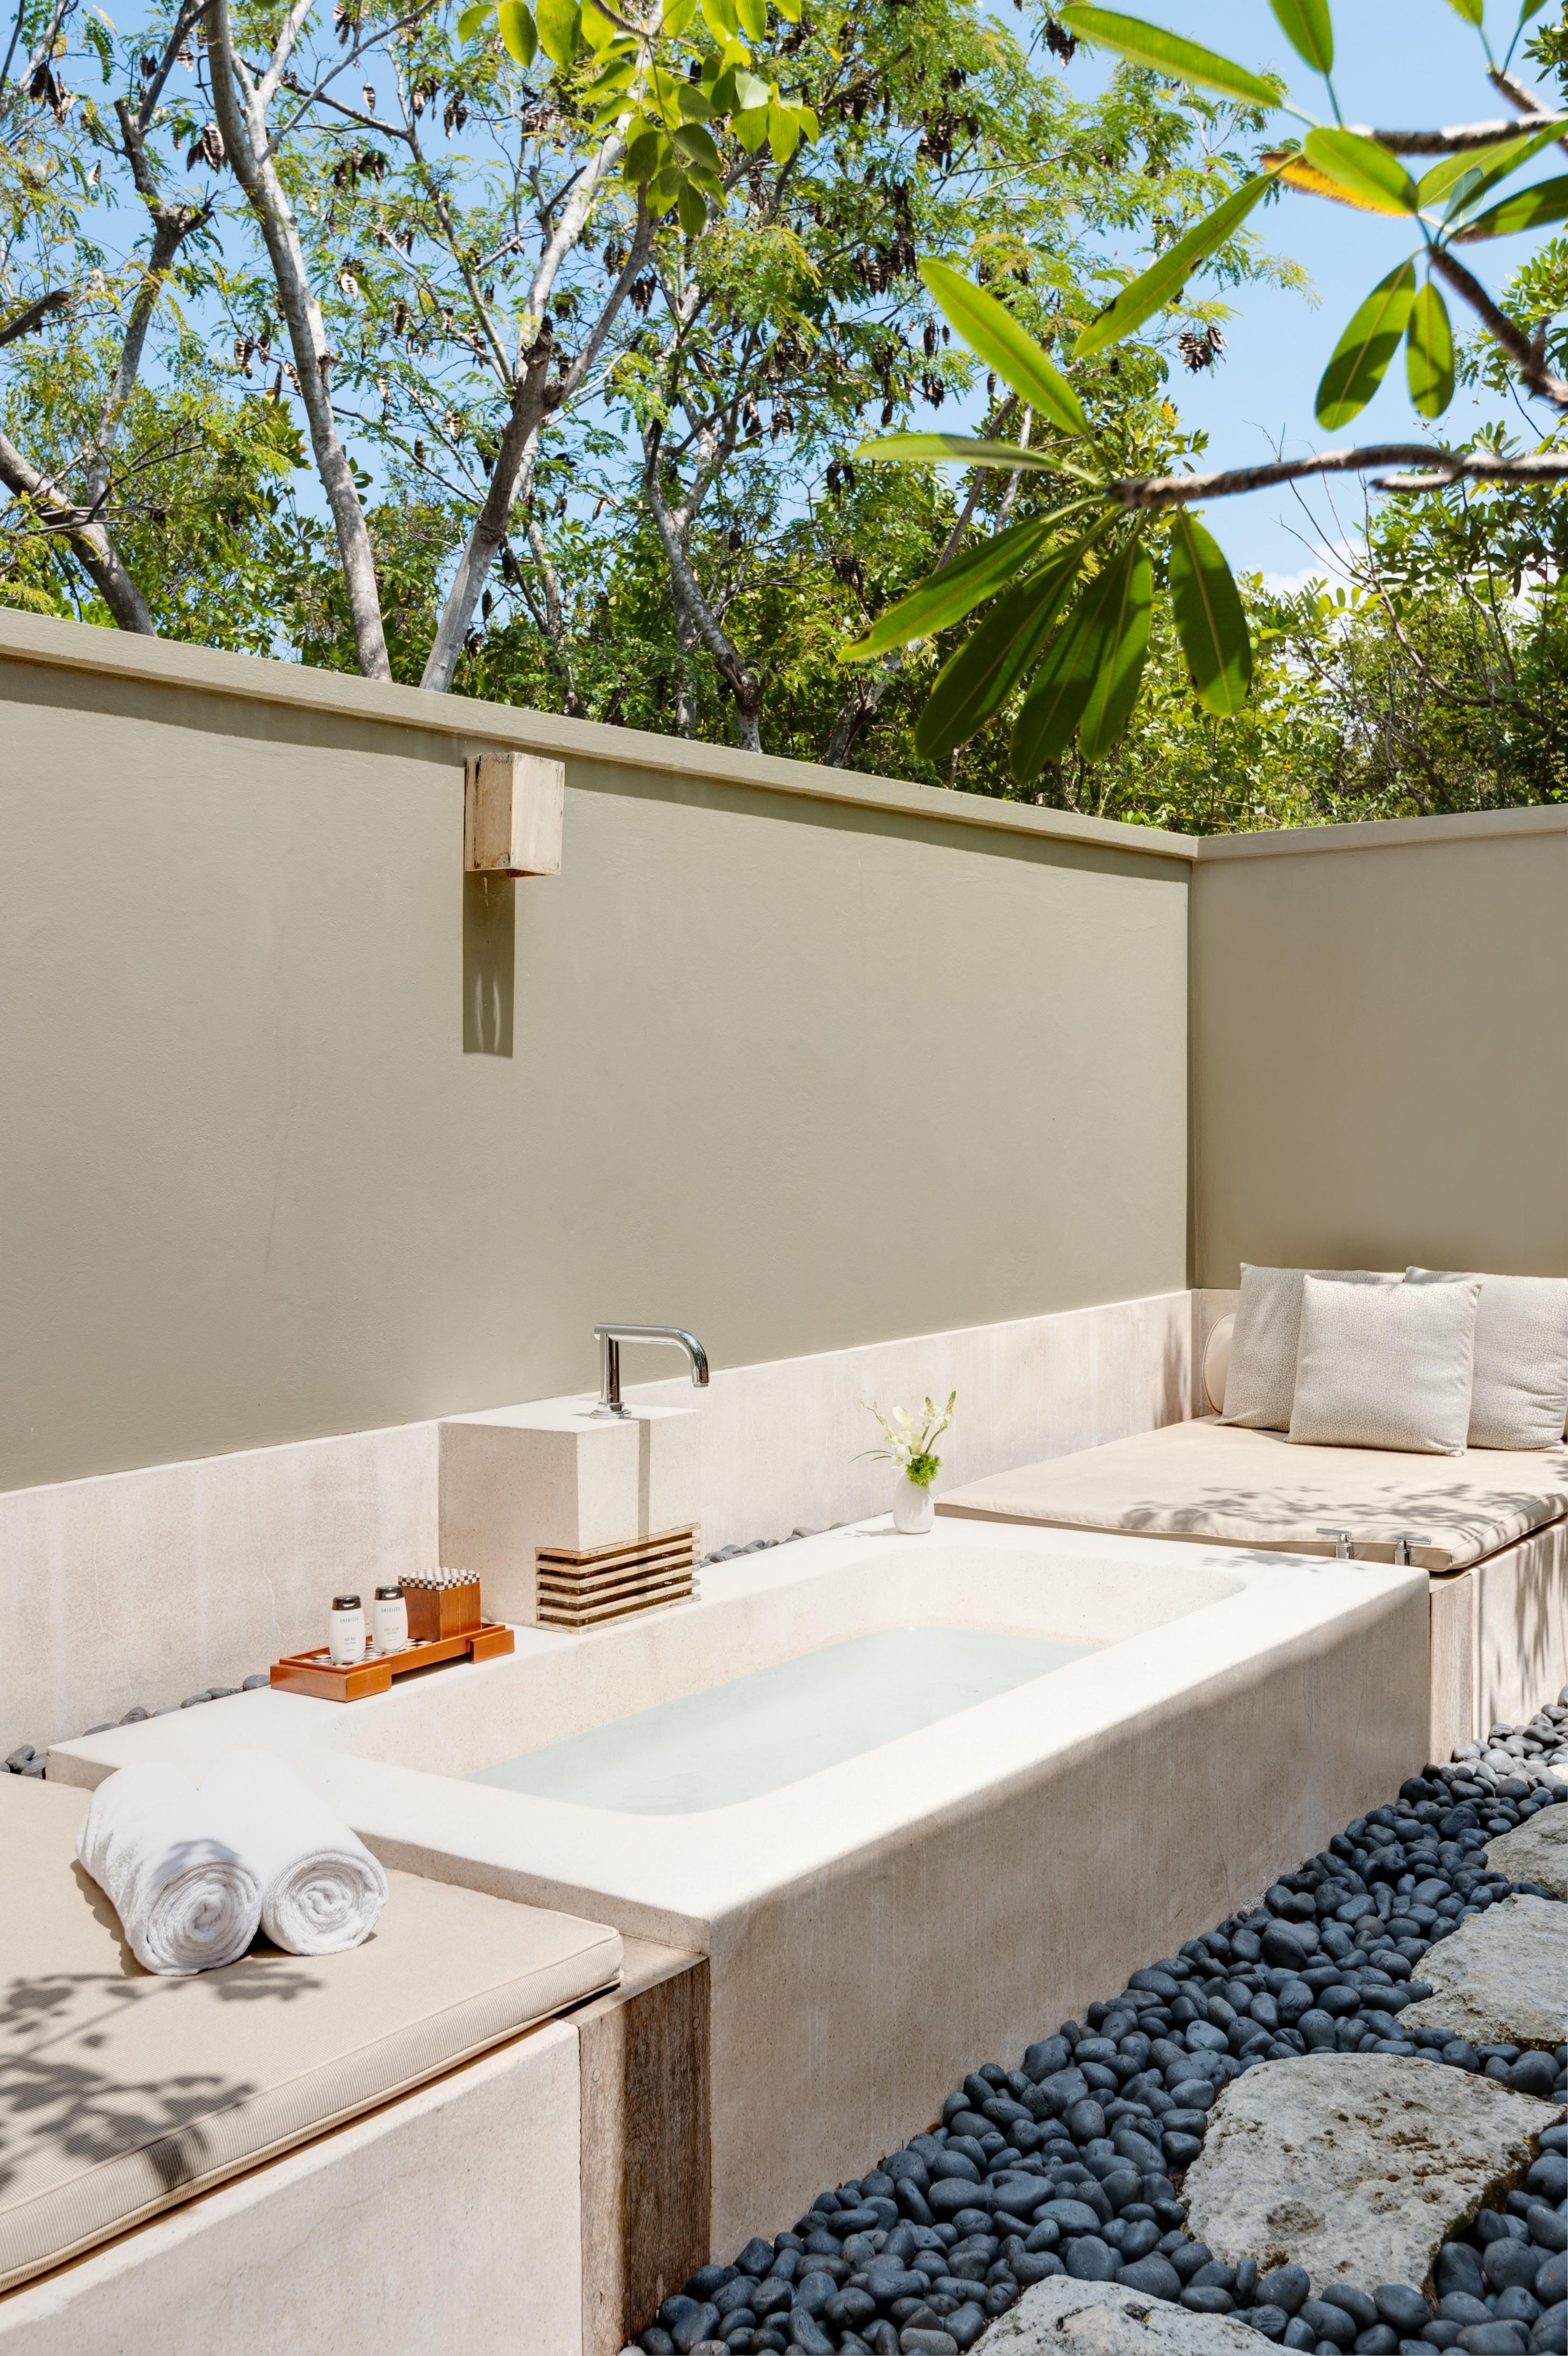 Additional photo for property listing at Amanyara Villa 14 Amanyara Resort, North West Point, Providenciales Islas Turcas Y Caicos